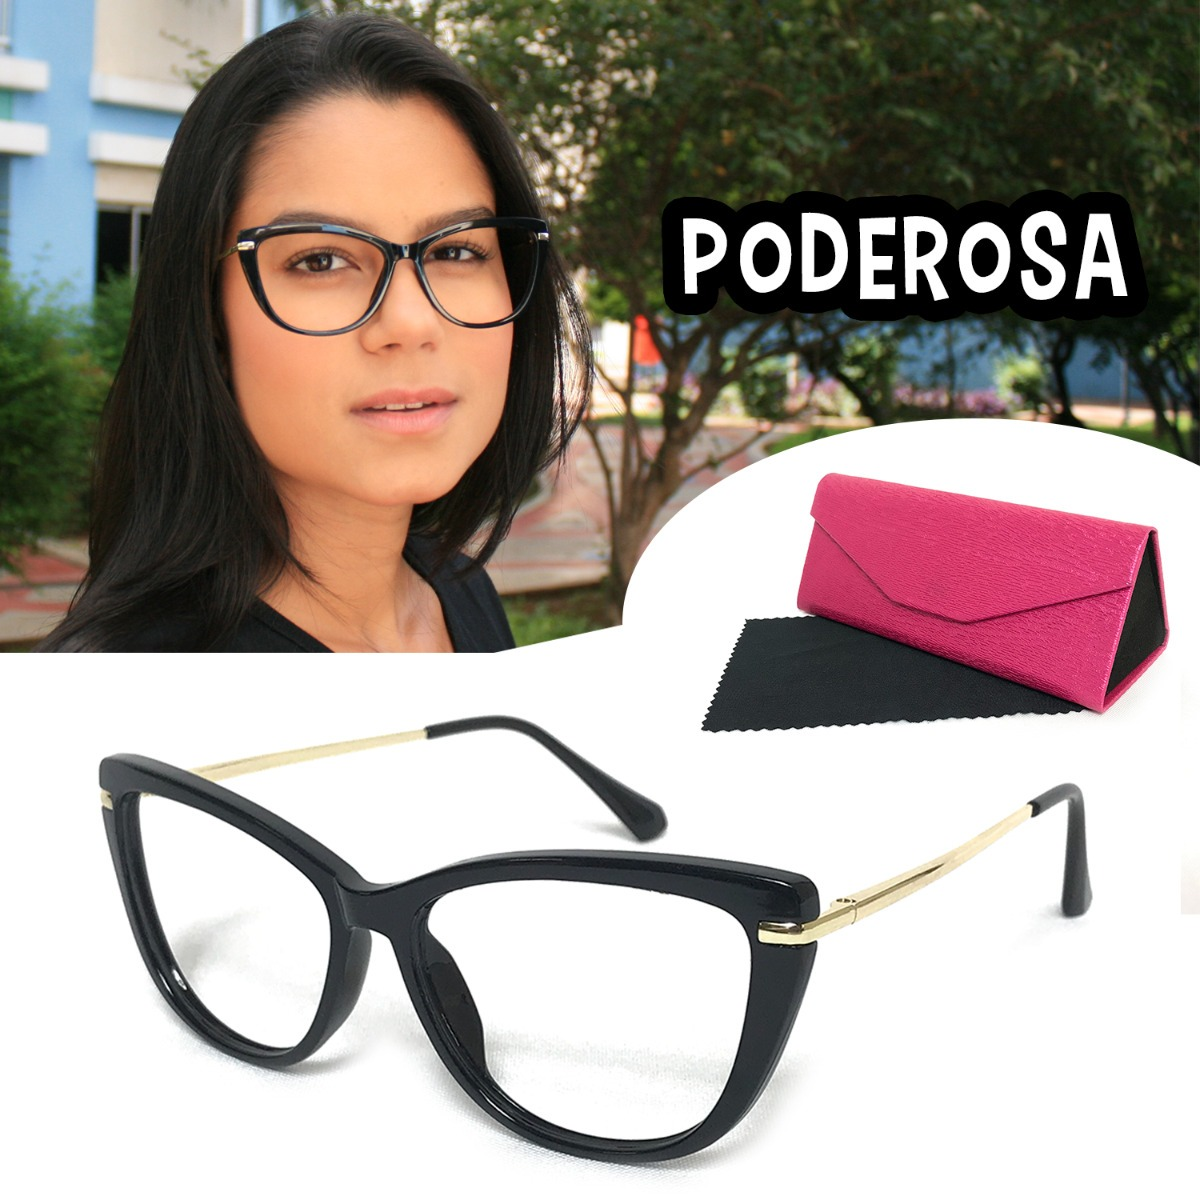 95d9a8bca1675 Armação Óculos Feminino Barato Retrô Vintage Geek Luxo 7203 - R  59 ...